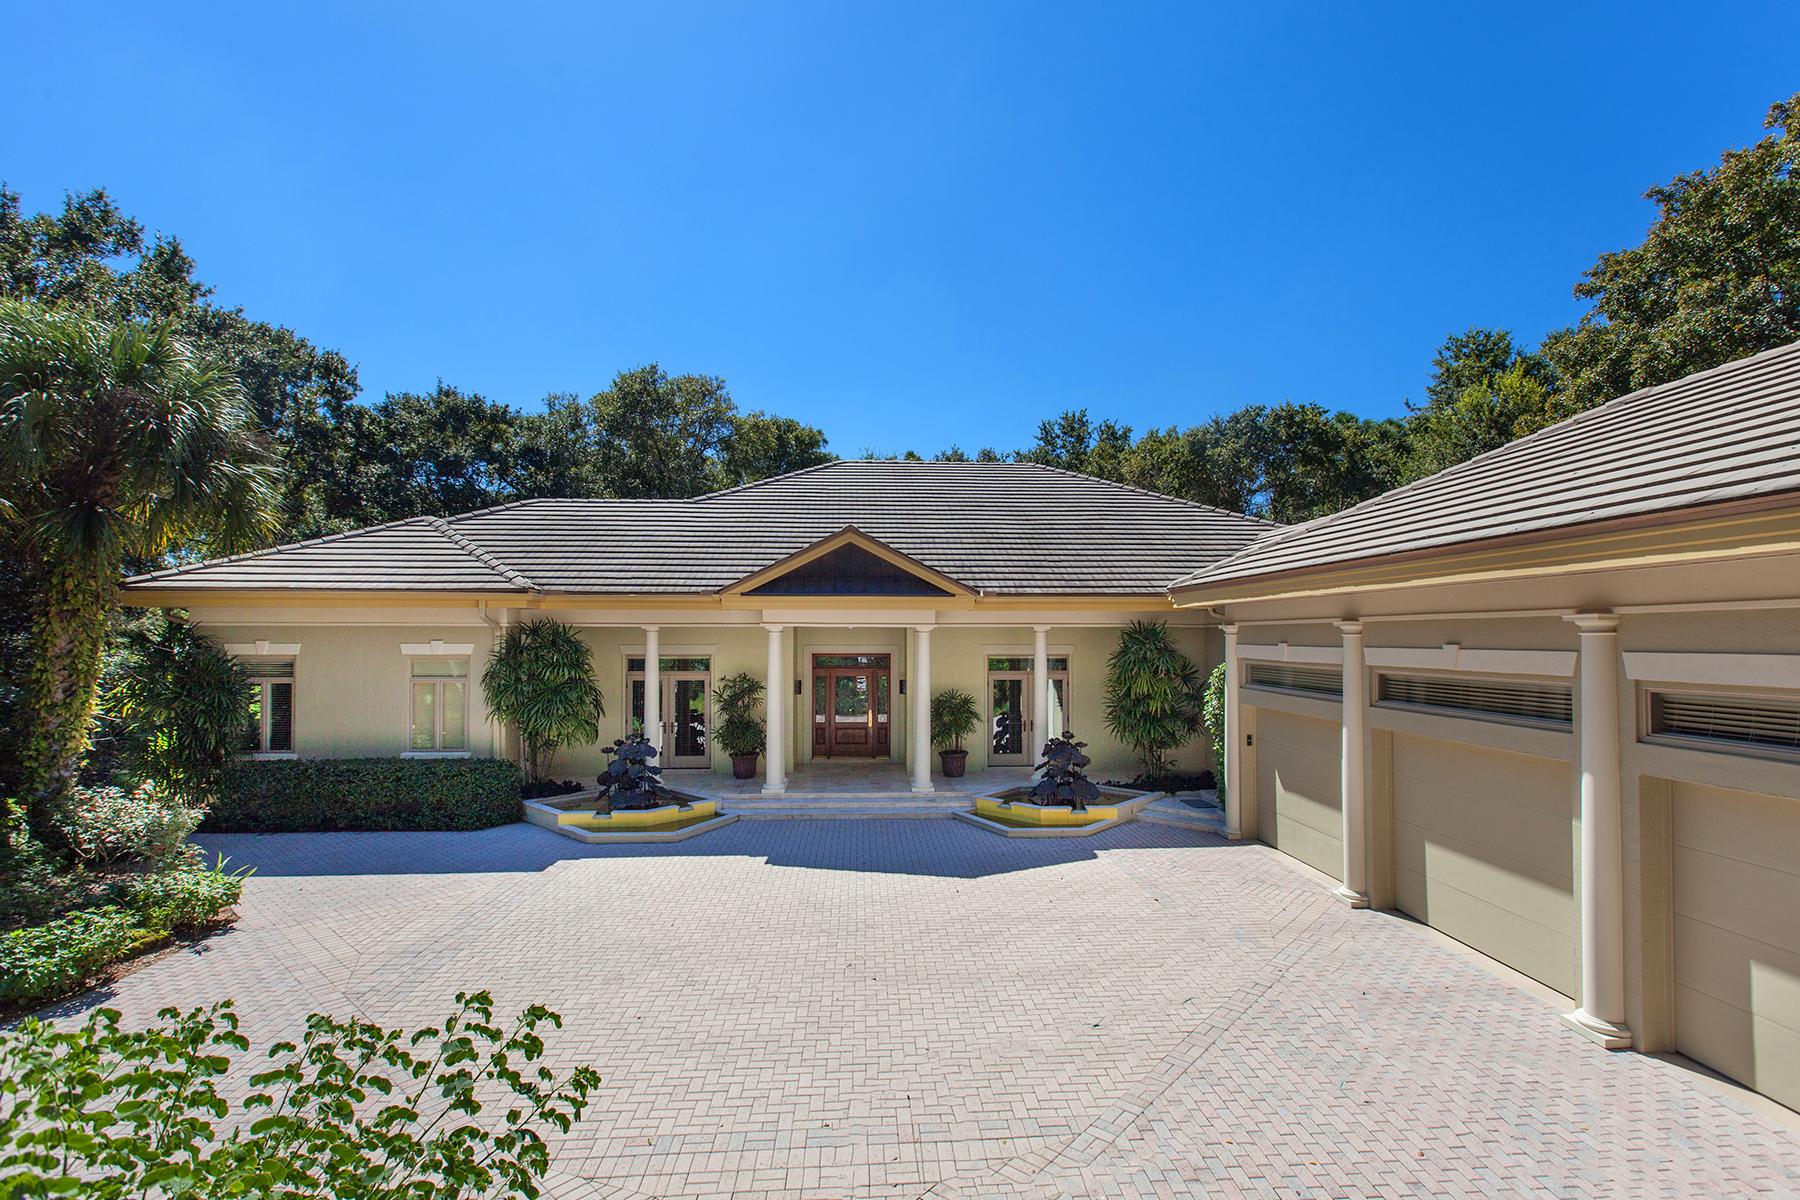 獨棟家庭住宅 為 出售 在 ORCHID TRACE 6590 Wild Orchid Ln Sarasota, 佛羅里達州 34241 美國